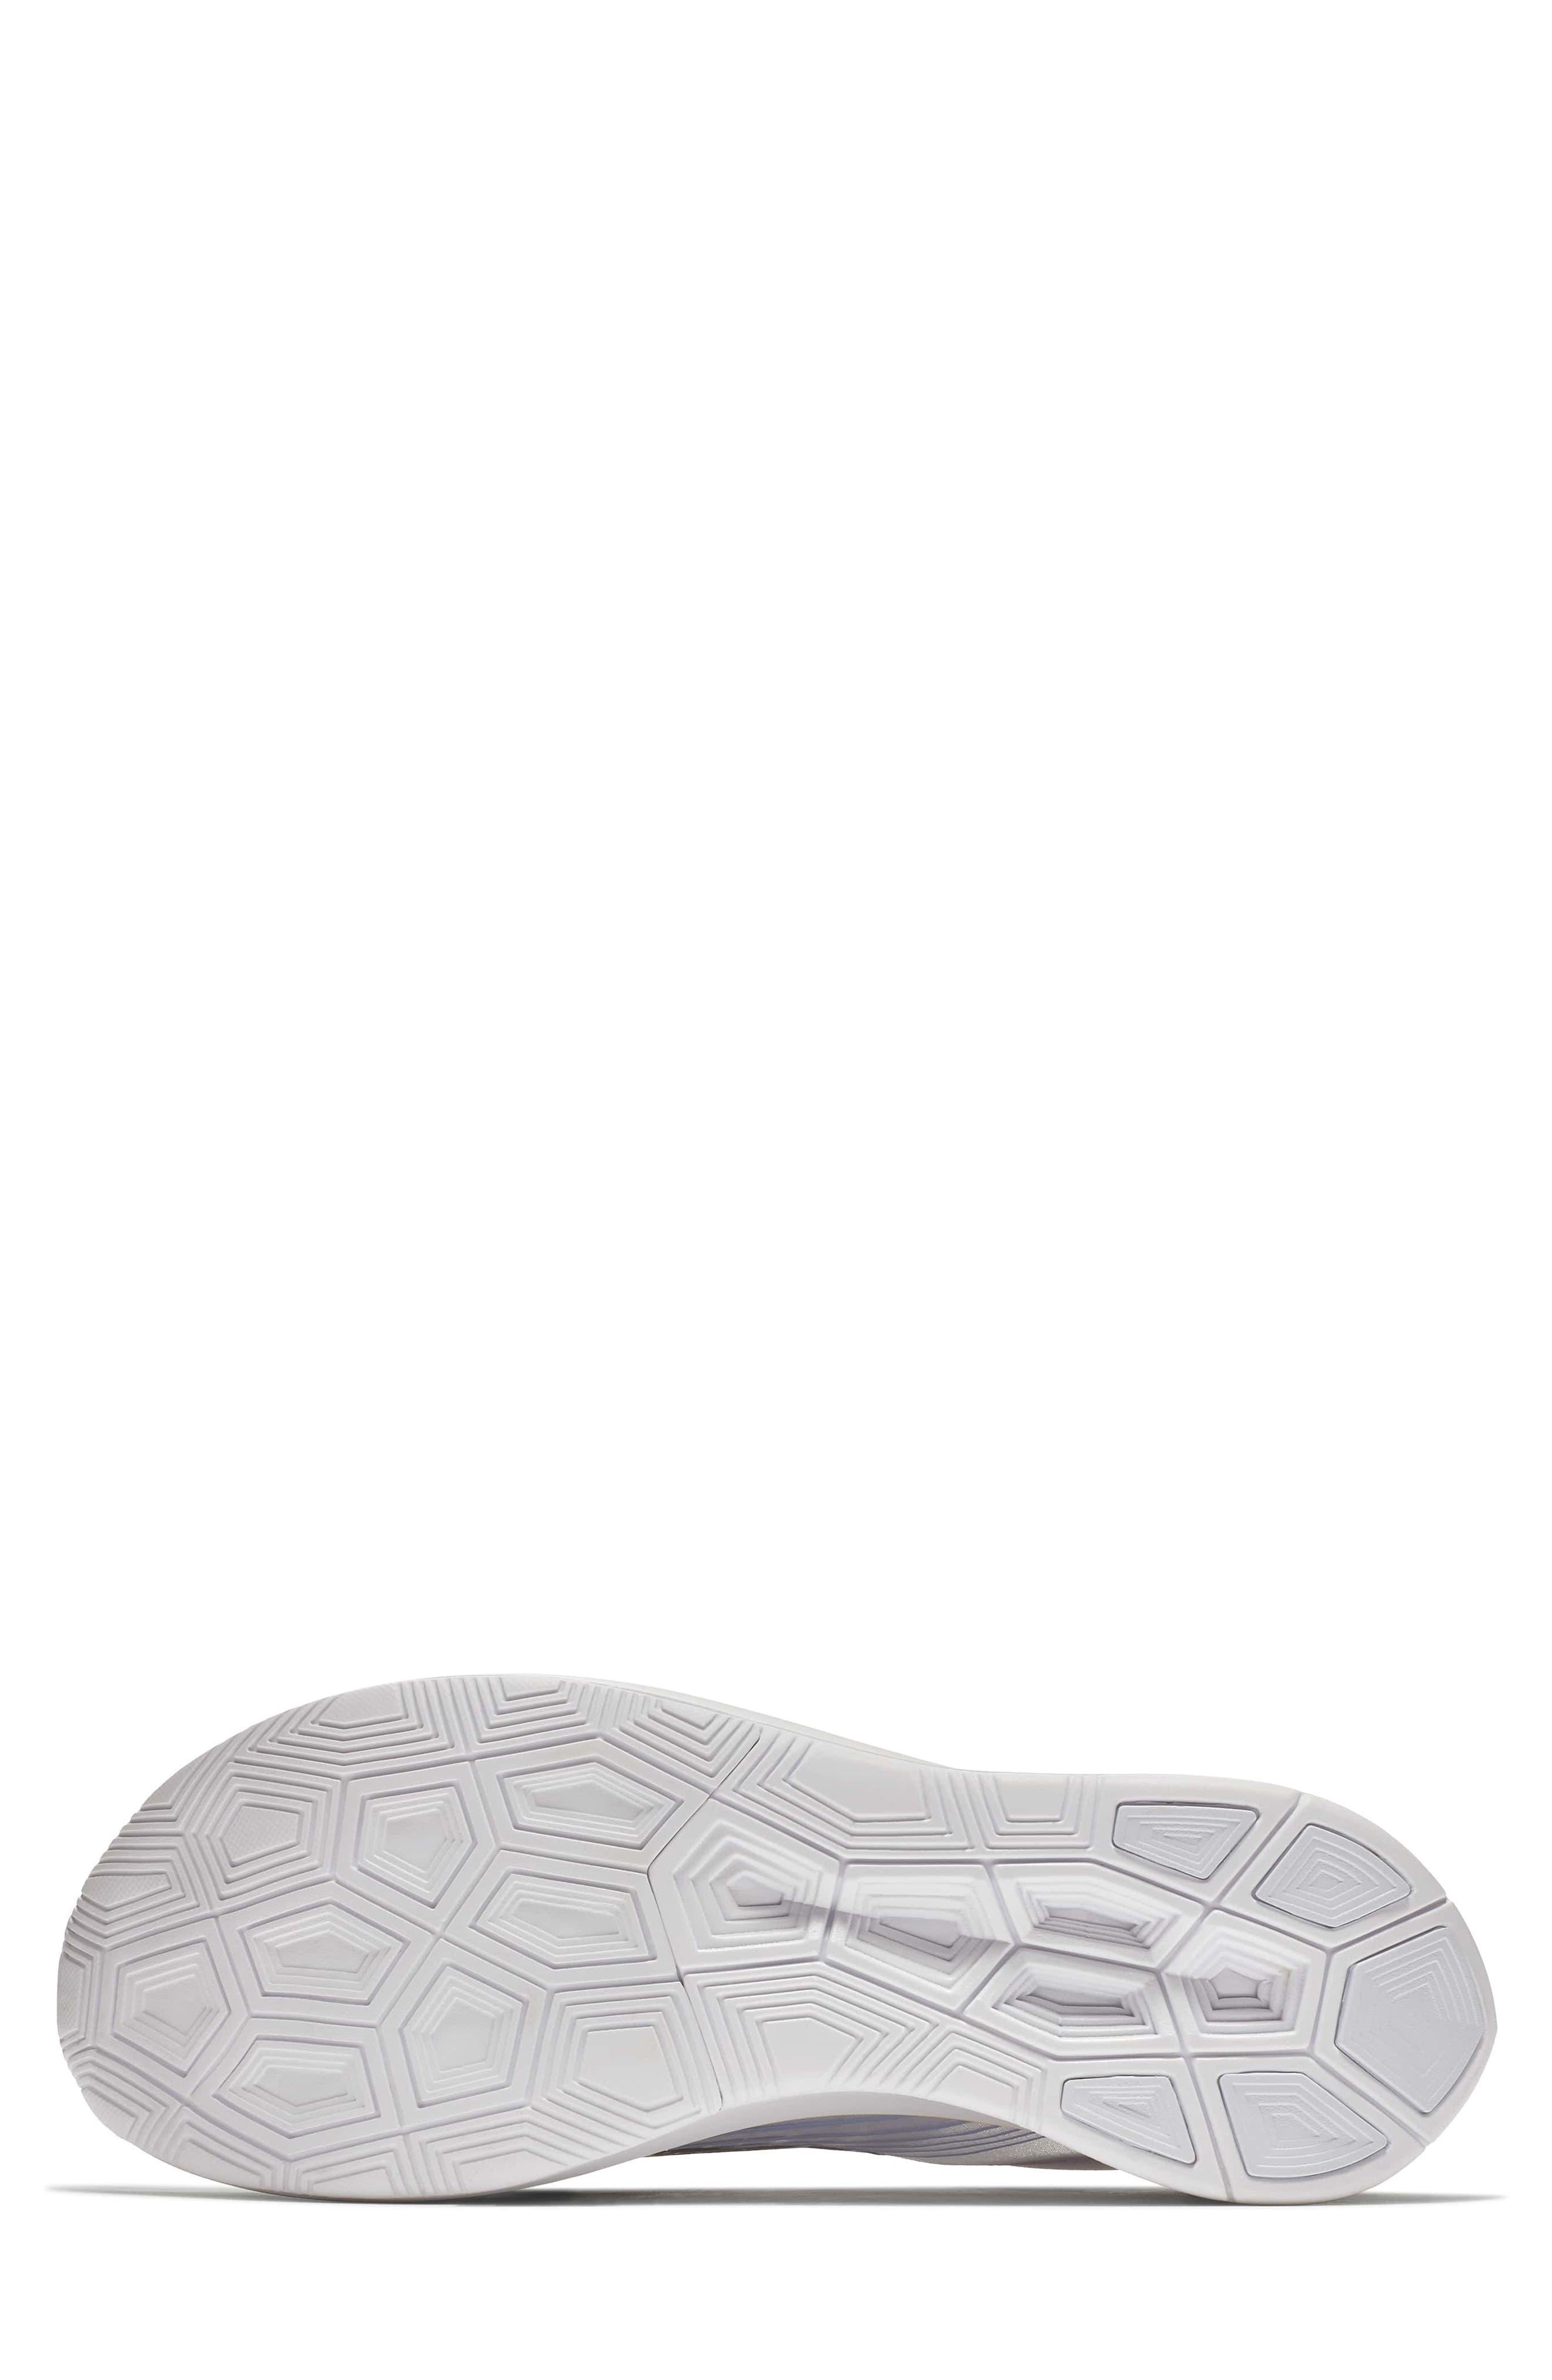 Nordstrom x Nike Zoom Fly BETRUE Running Shoe,                             Alternate thumbnail 6, color,                             White/ Black/ Palest Purple